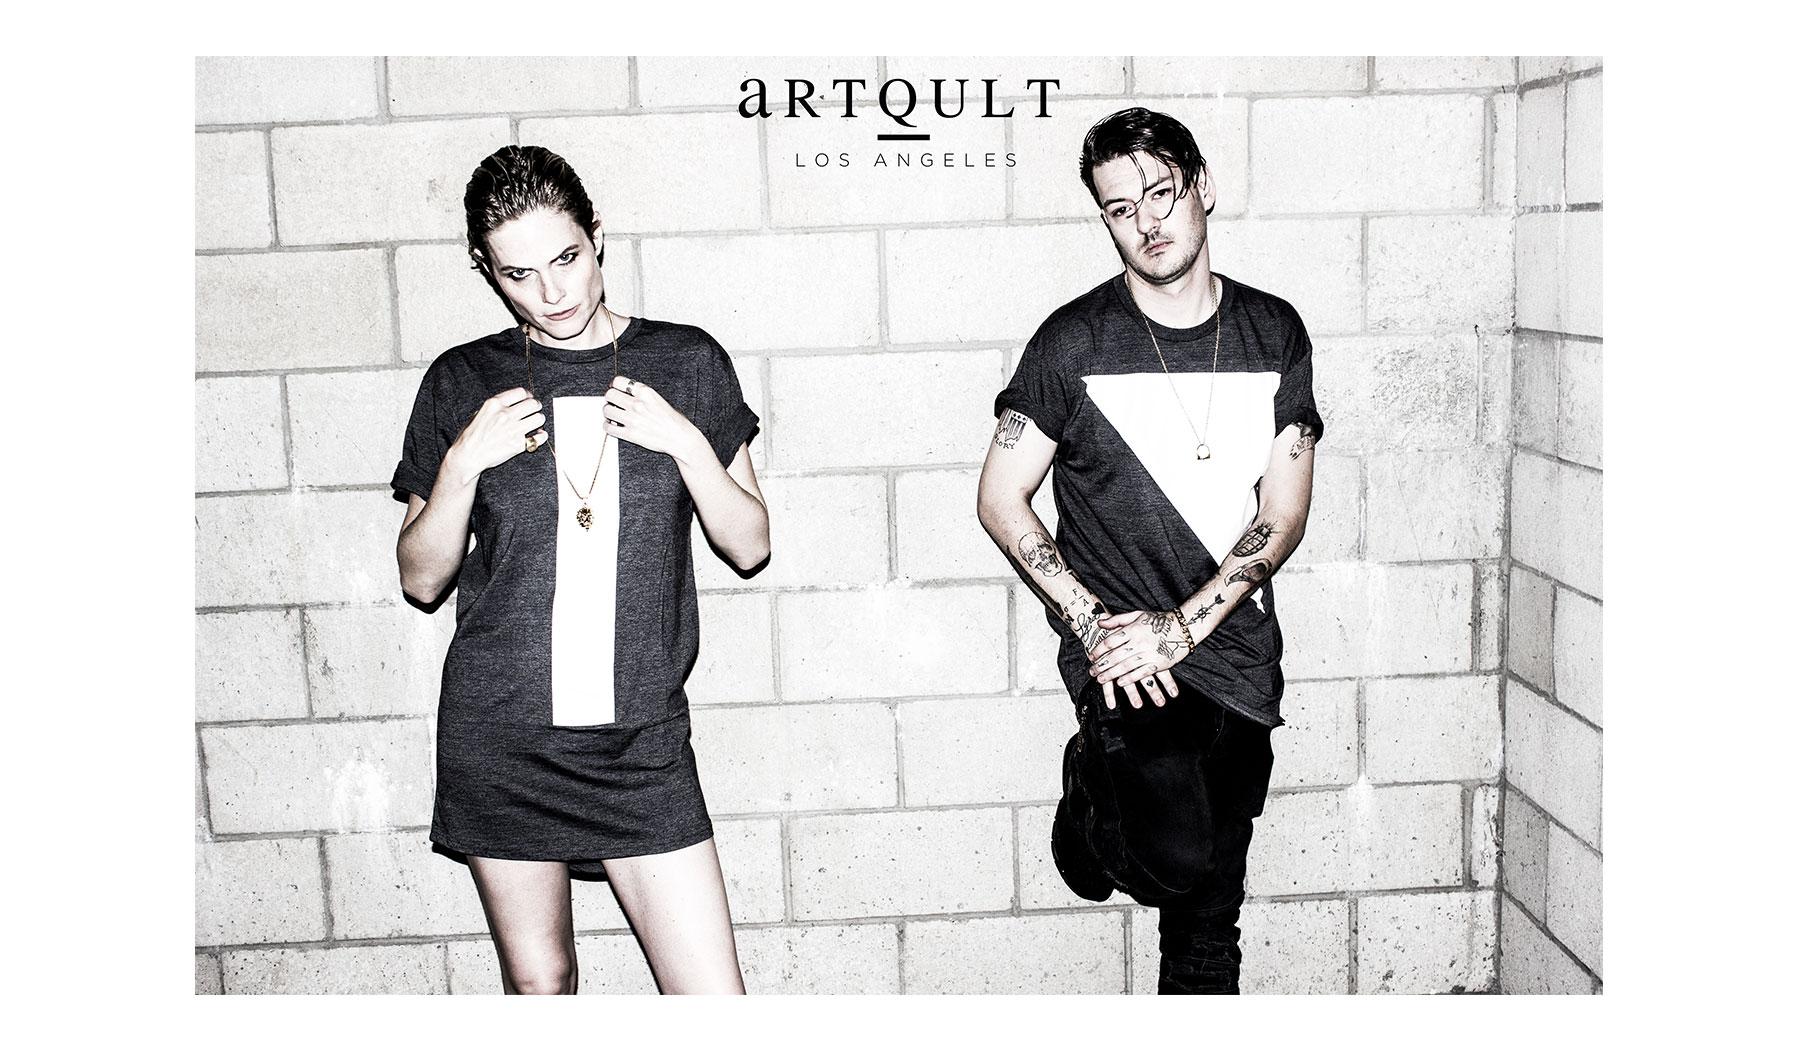 ARTQULT-LOS-ANGELES-LOOKBOOK-13.jpg